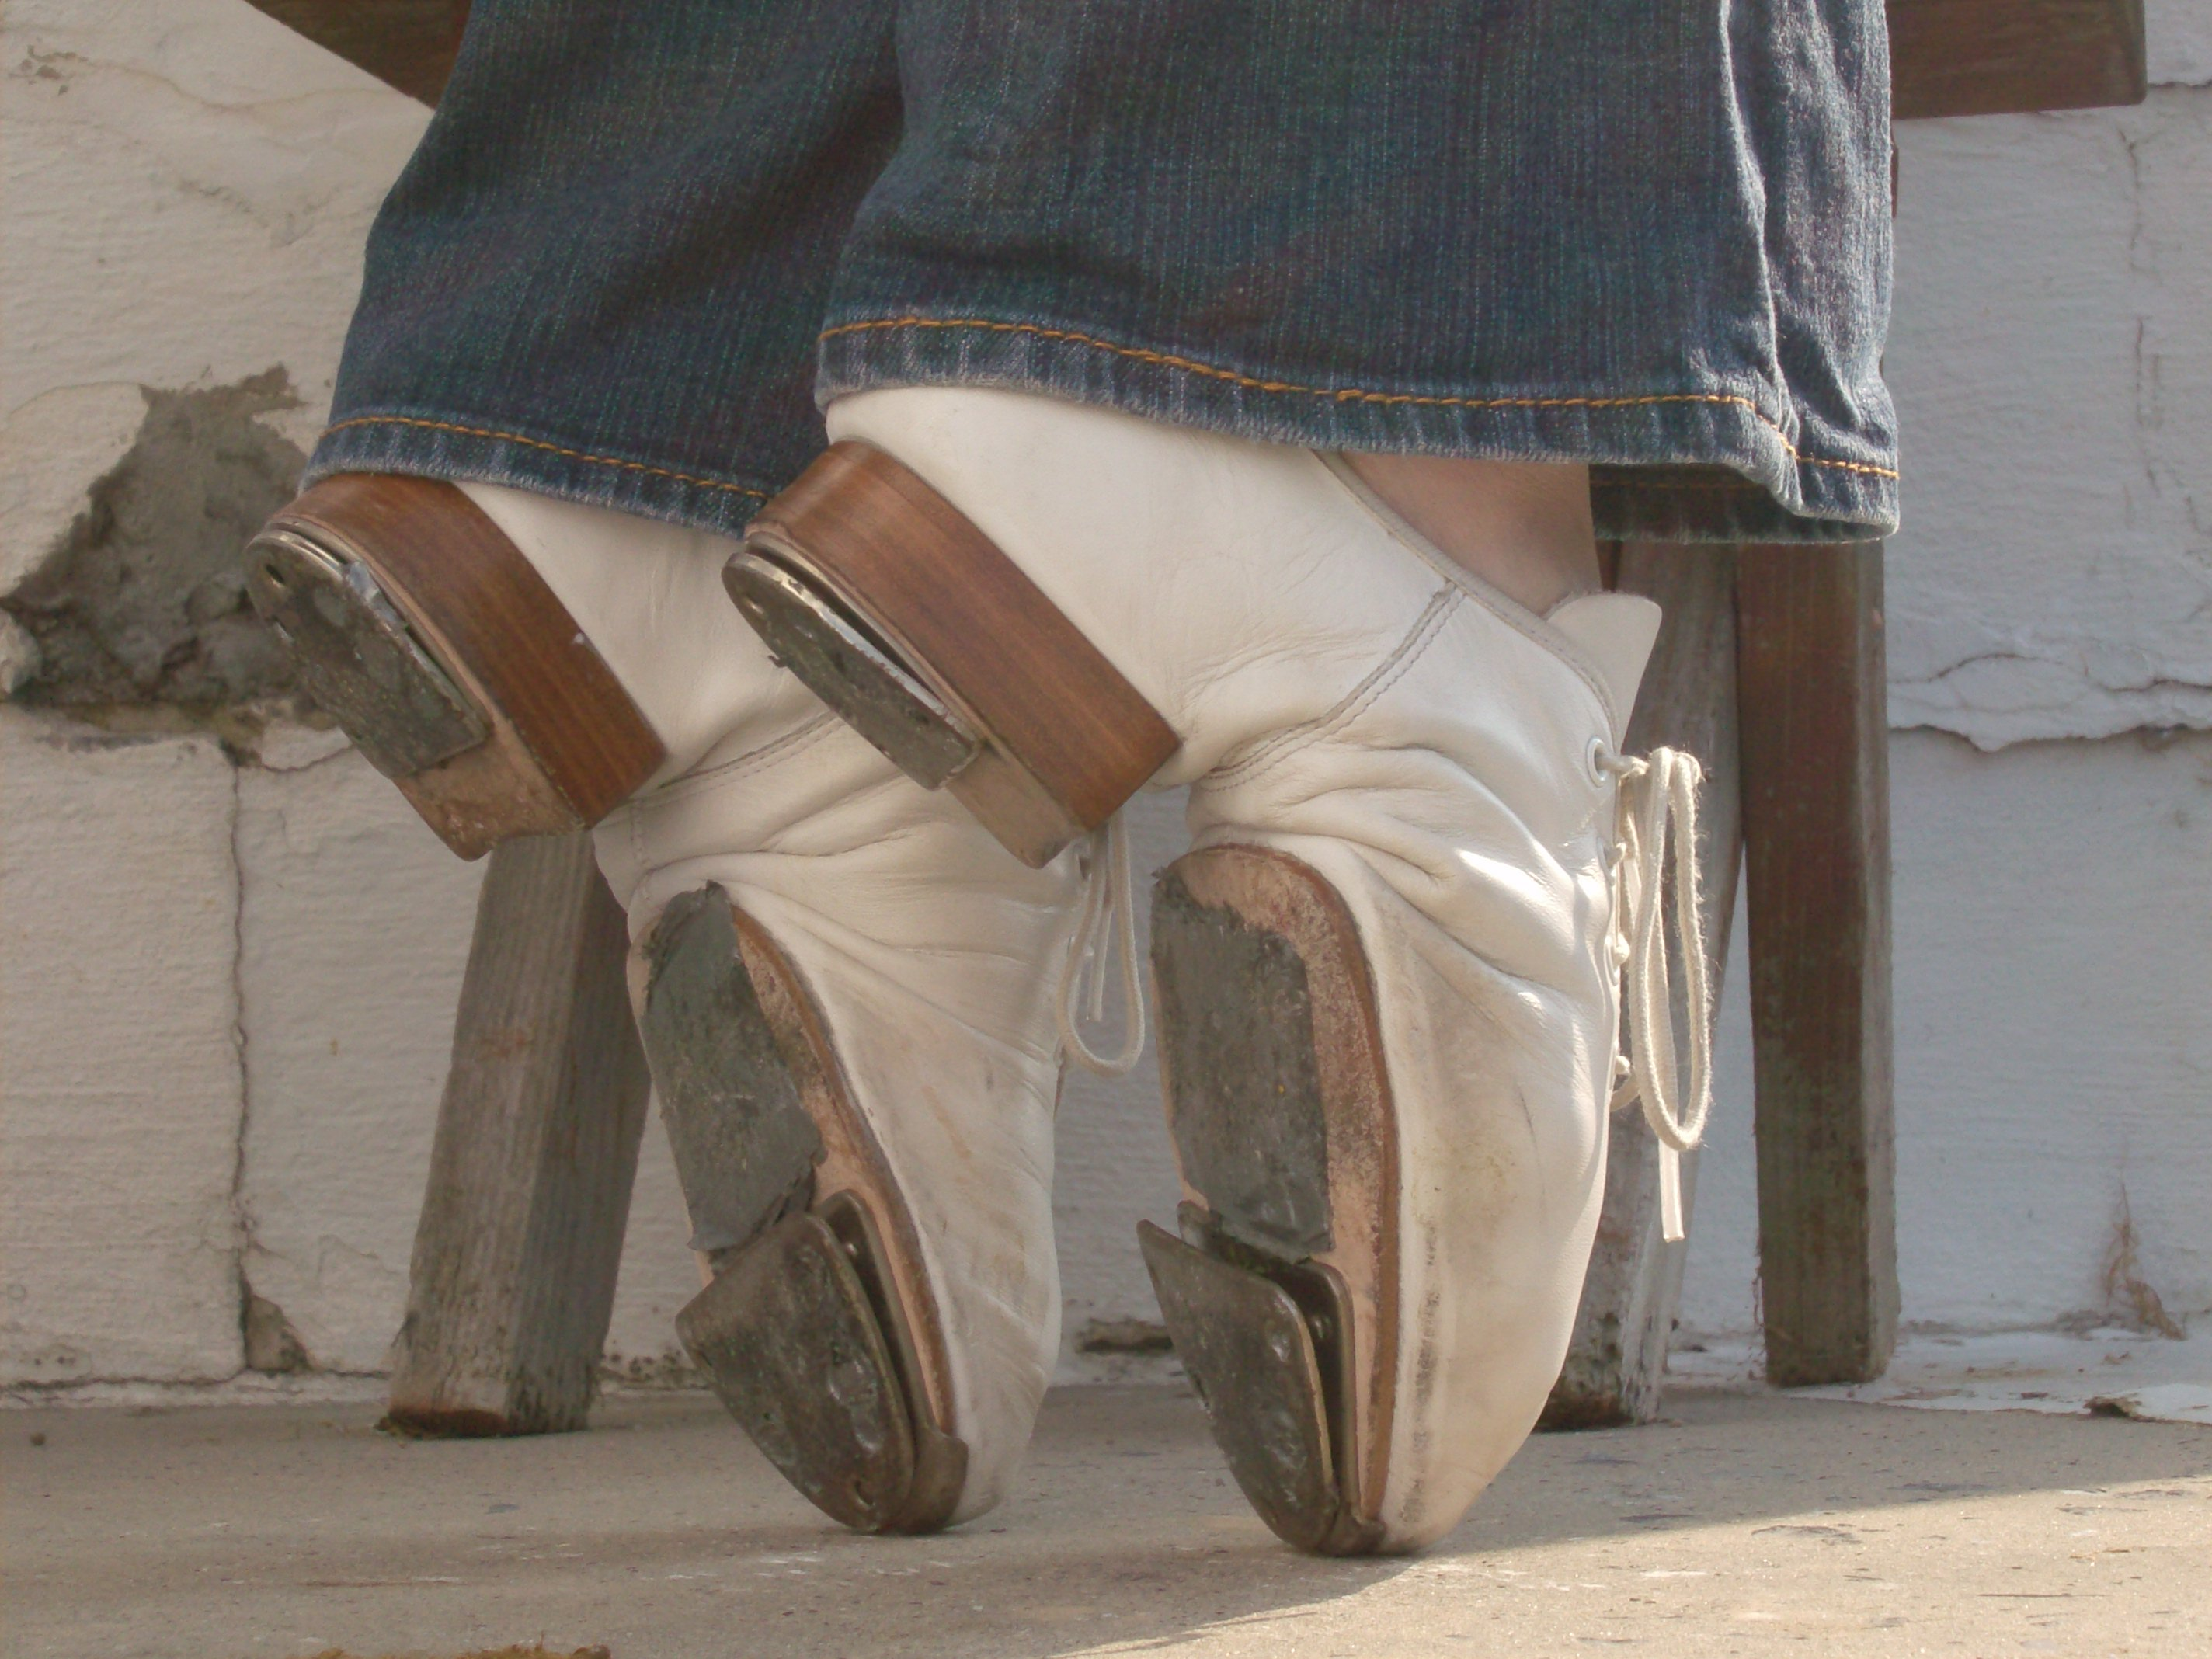 The Clogging Shoe | 4dancers